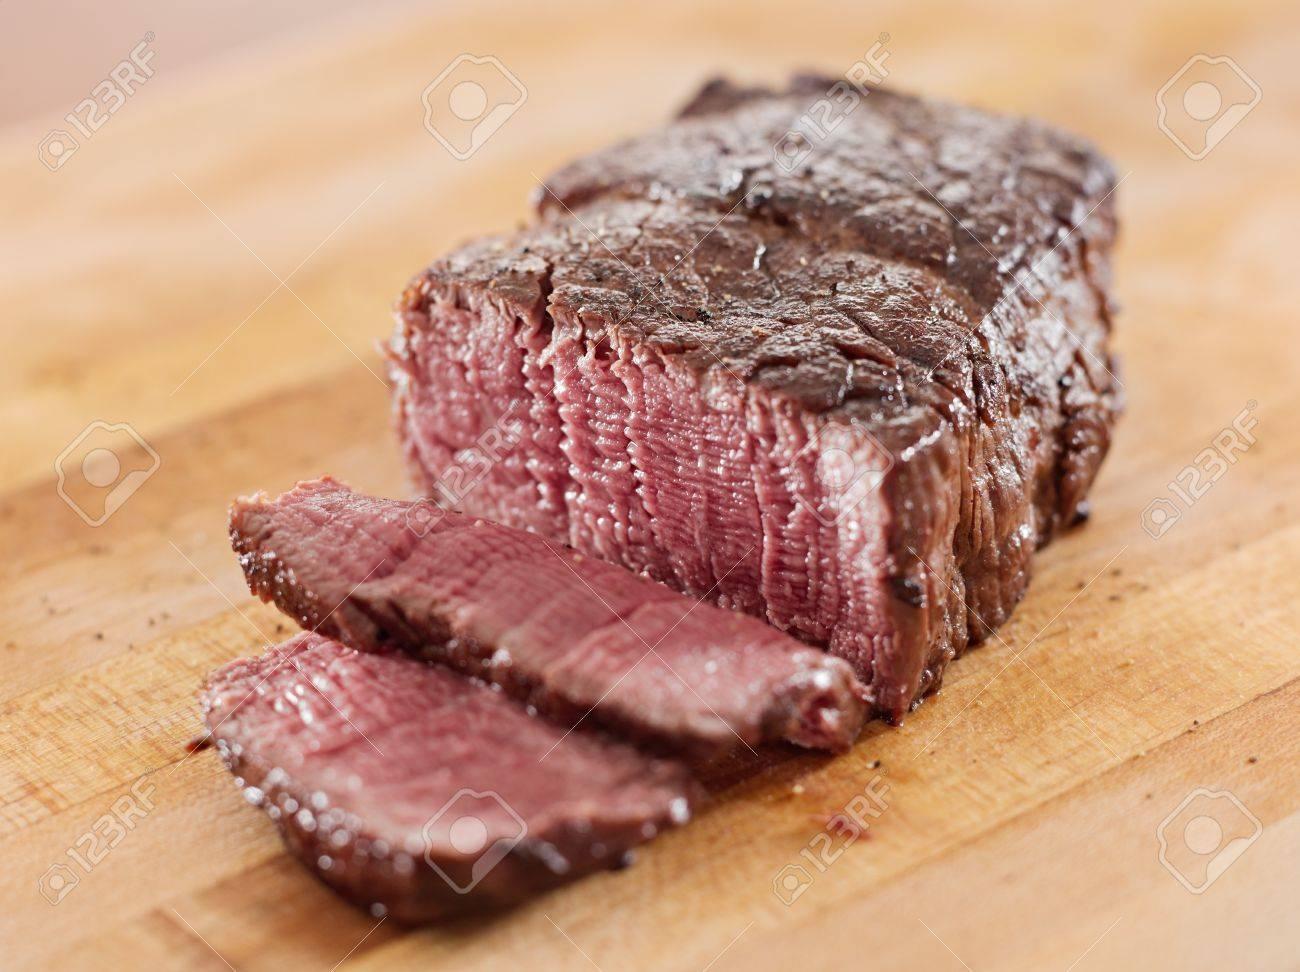 Sliced roast beef package - Stock Photo Steak Cooked Fillet Of Beef Sliced Open